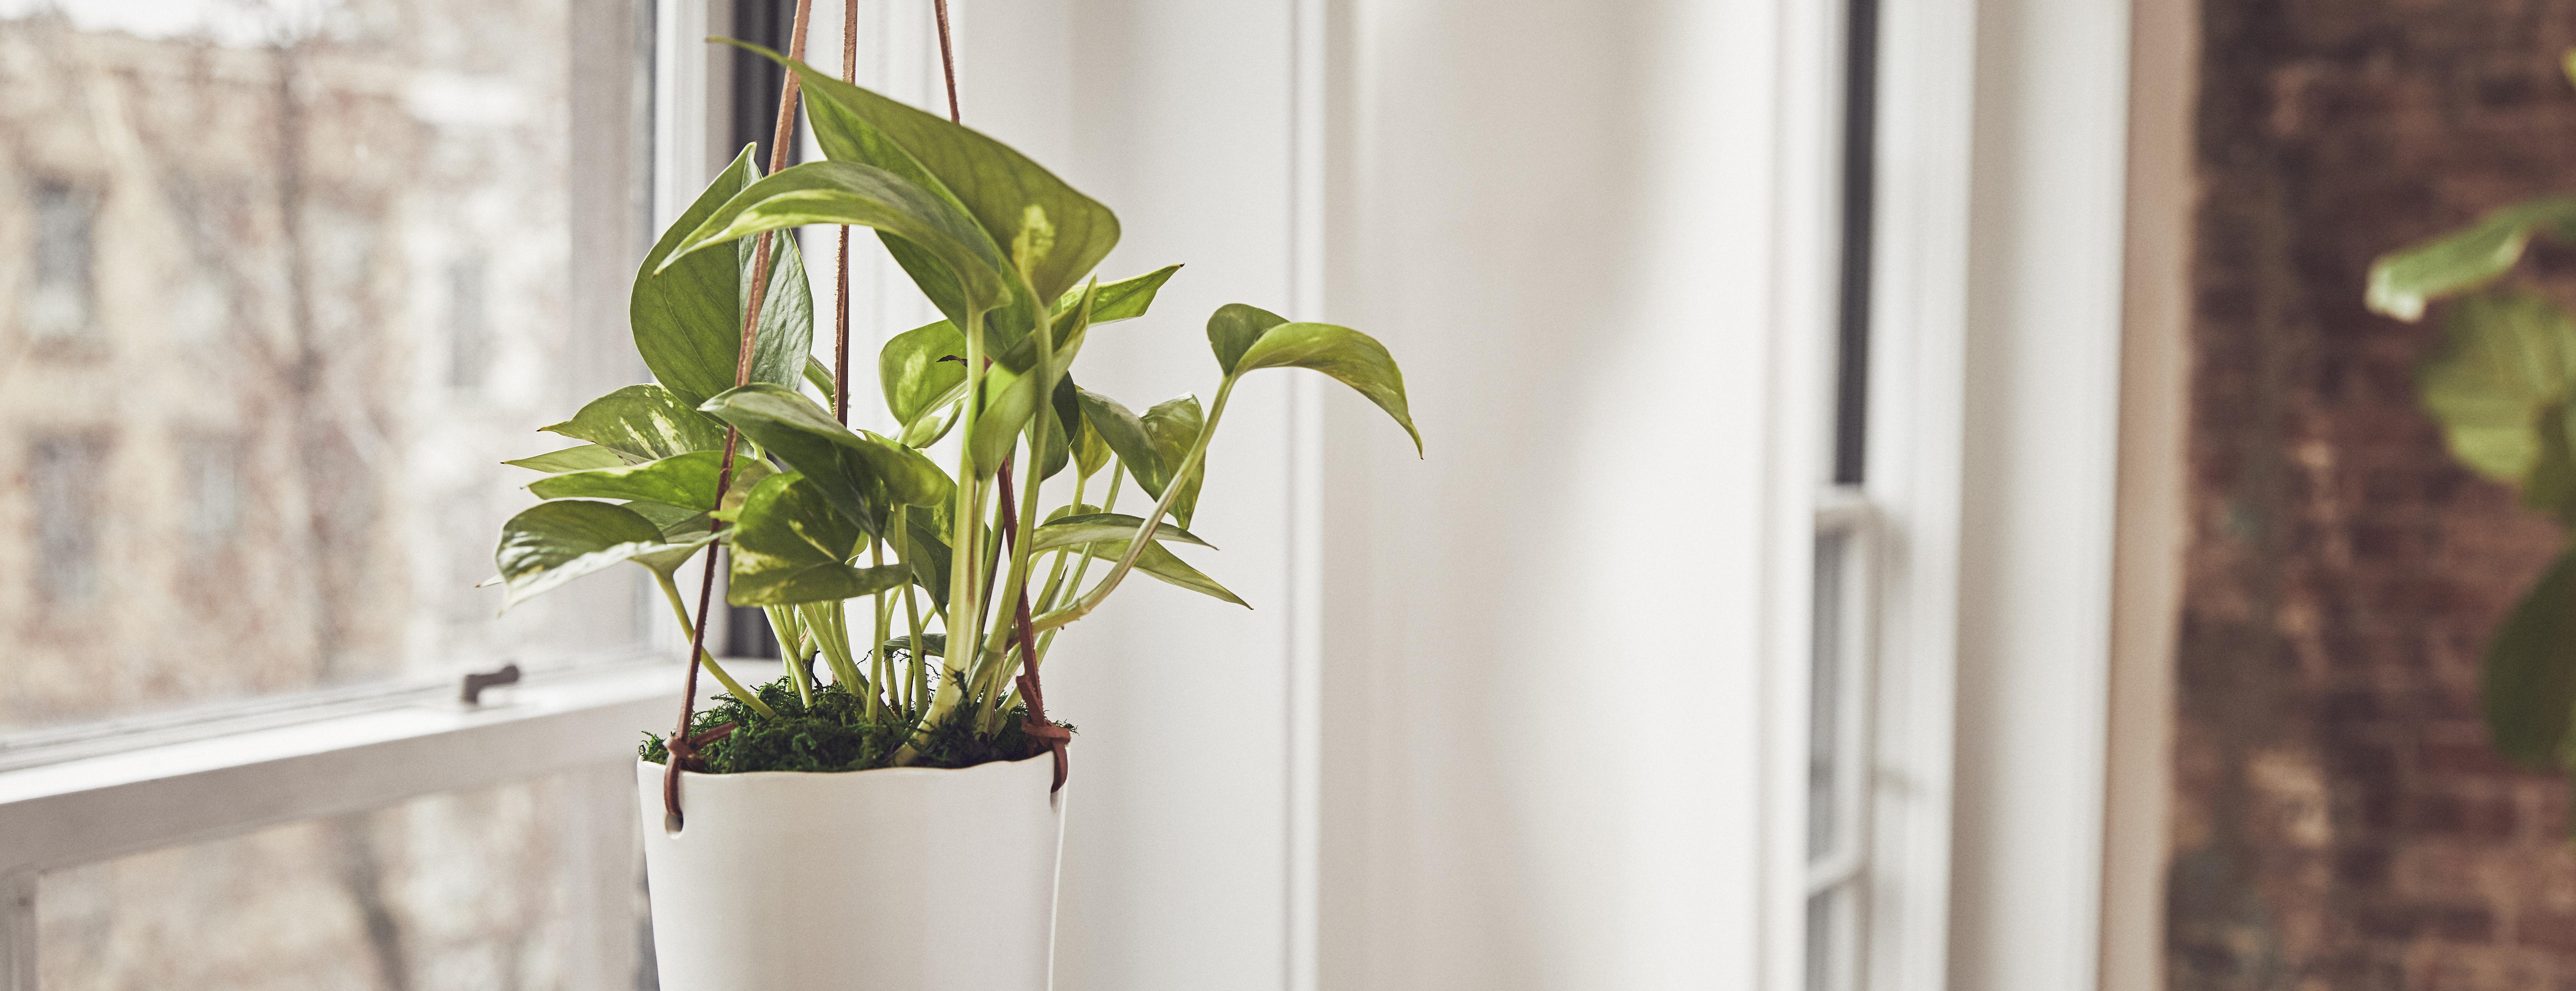 Pothos plant hanging in a sunlit window.